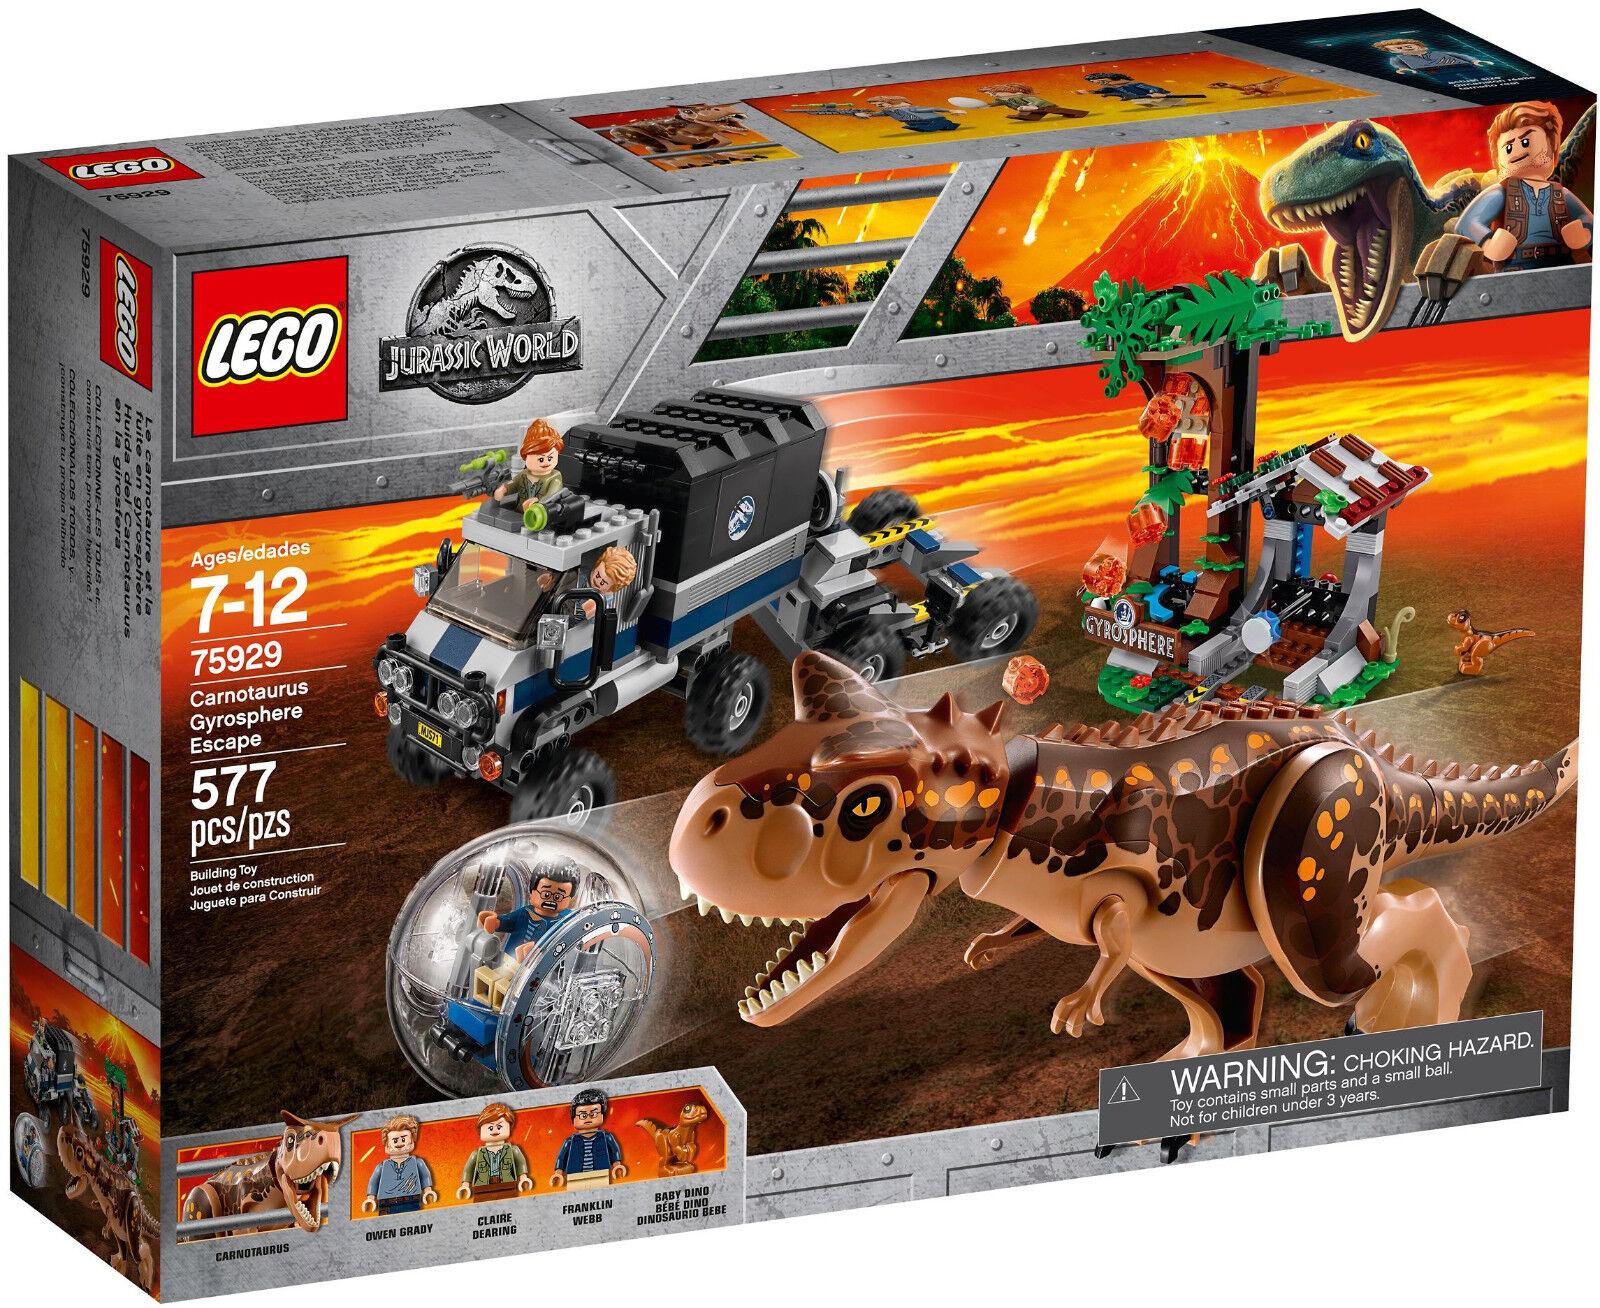 LEGO Jurassic World - 75929 Carnotaurus Flucht in der Gyrosphere - Neu & OVP